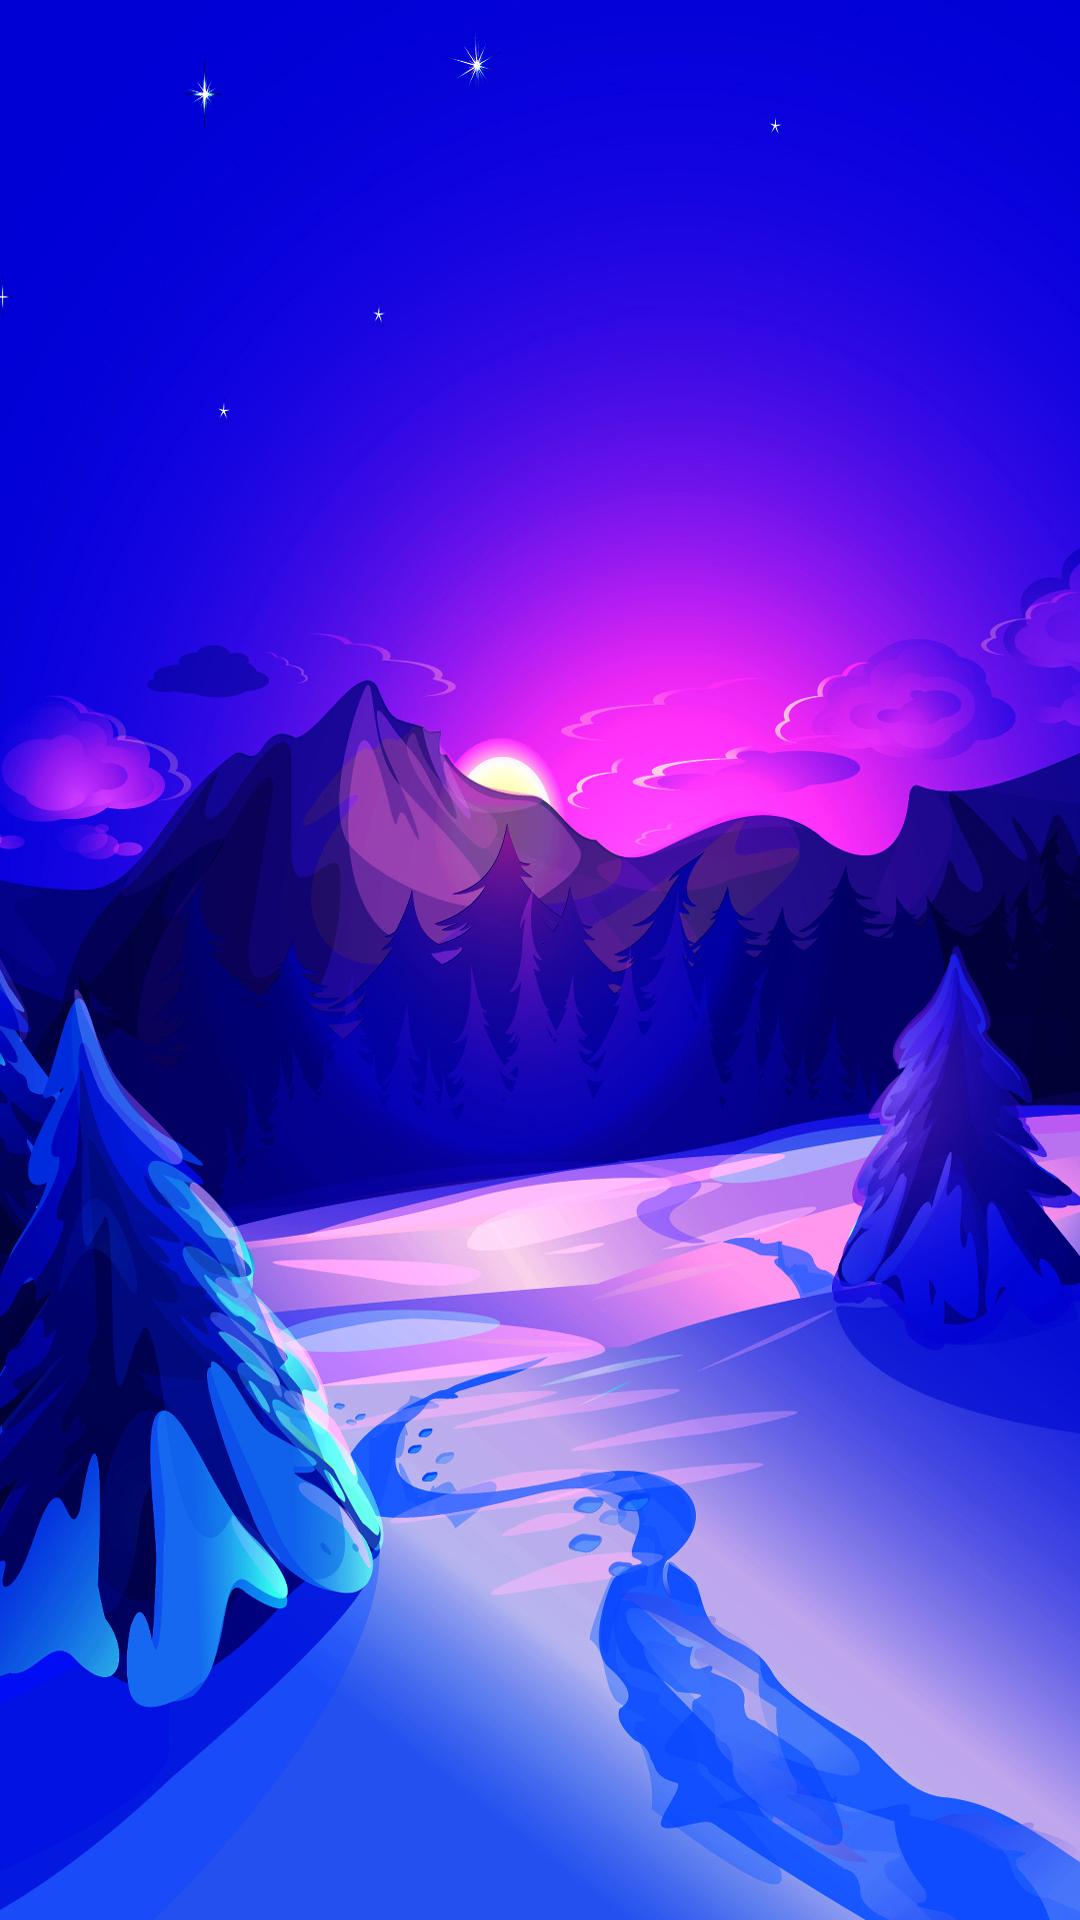 Winter night digital art mobile wallpaper